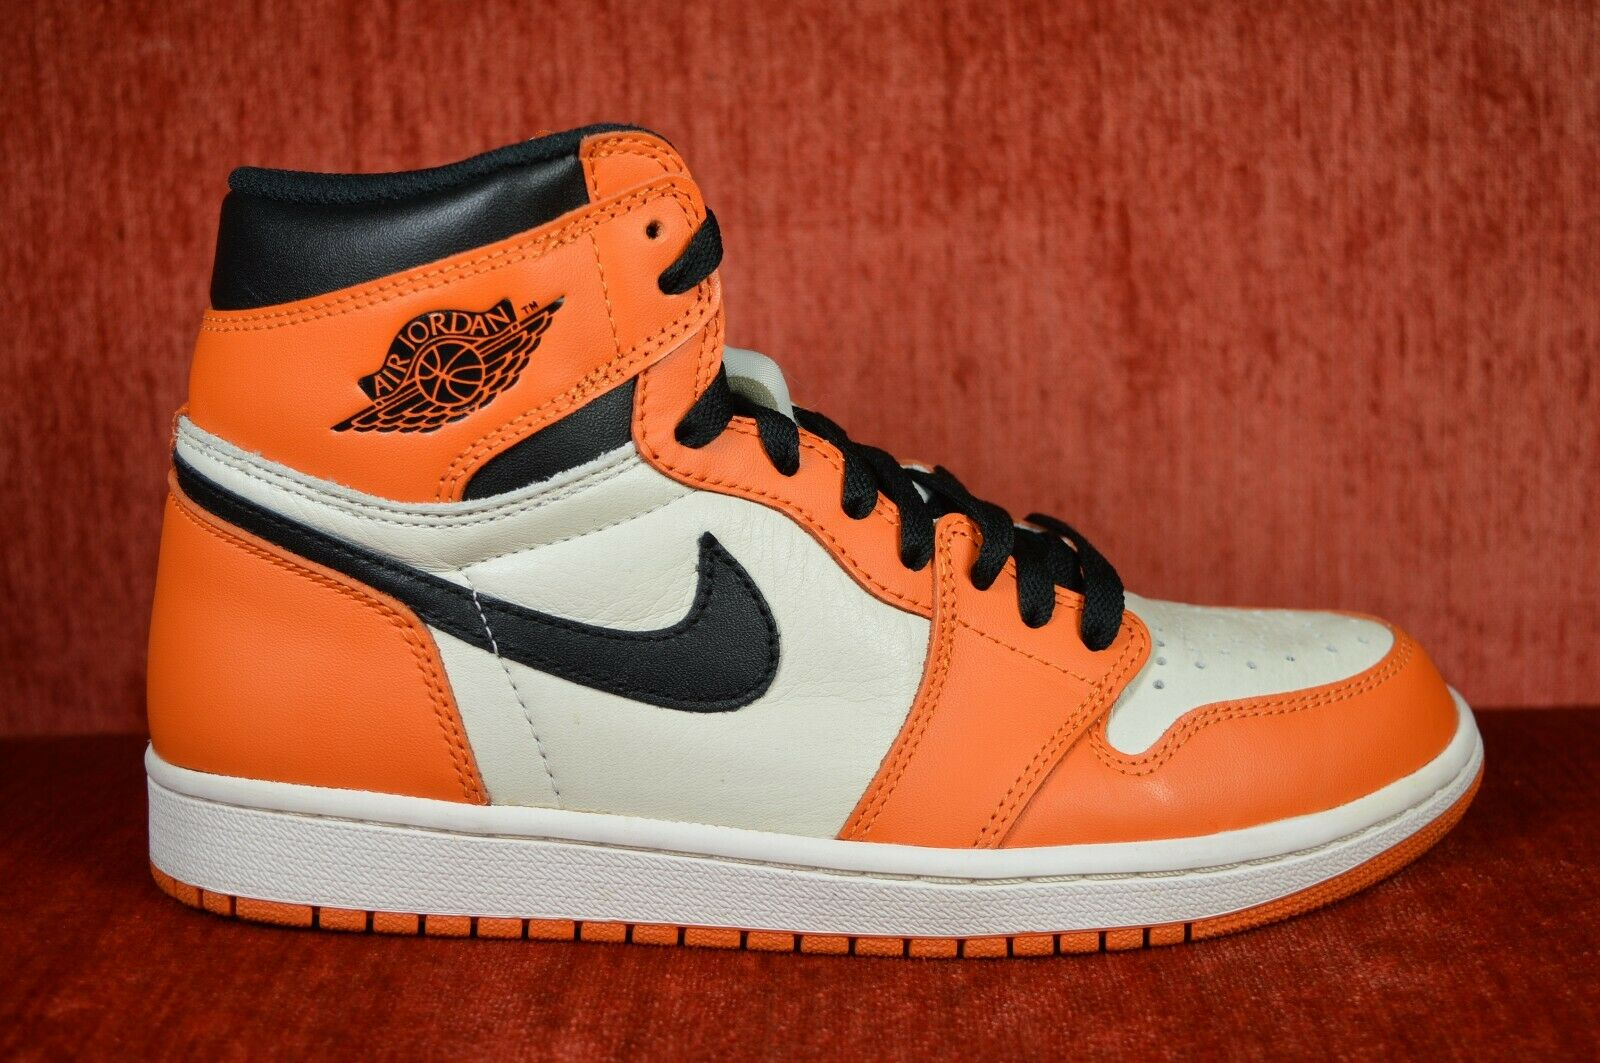 WORN TWICE Nike Air Jordan I 1 Retro High REVERSE  SHATTERED BACKBOARD Size 8